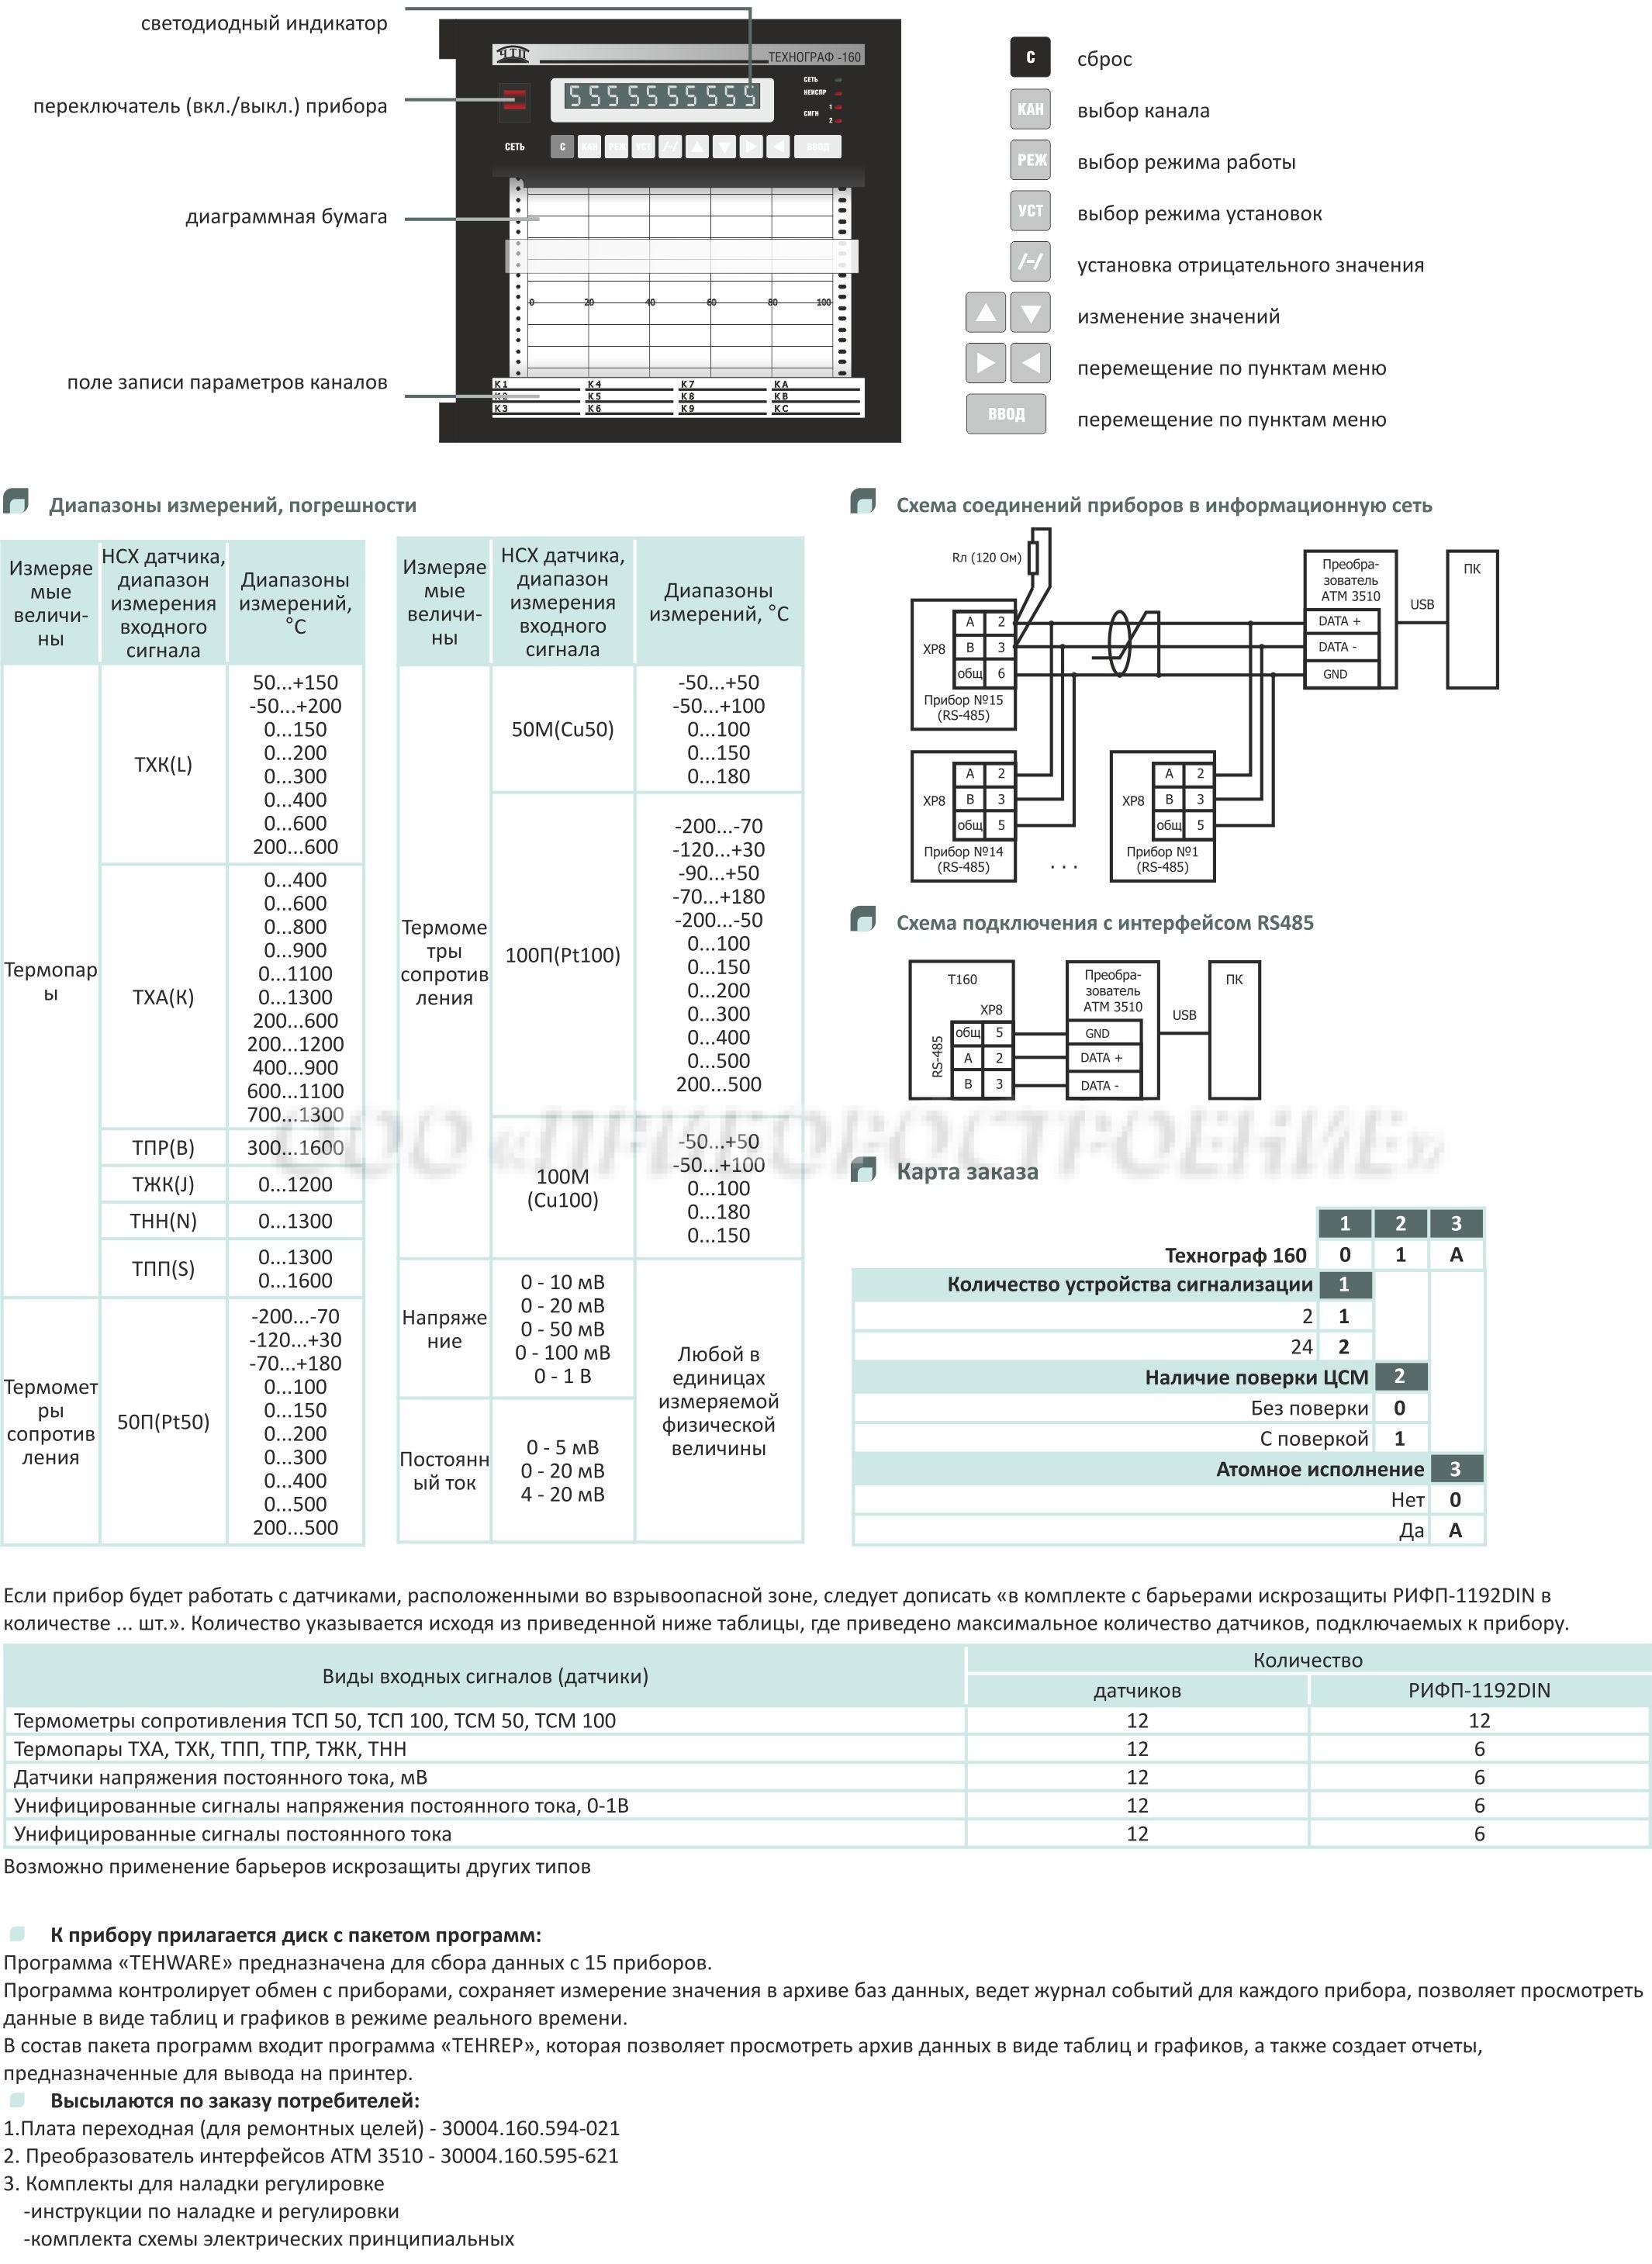 tehnograf-160m-2